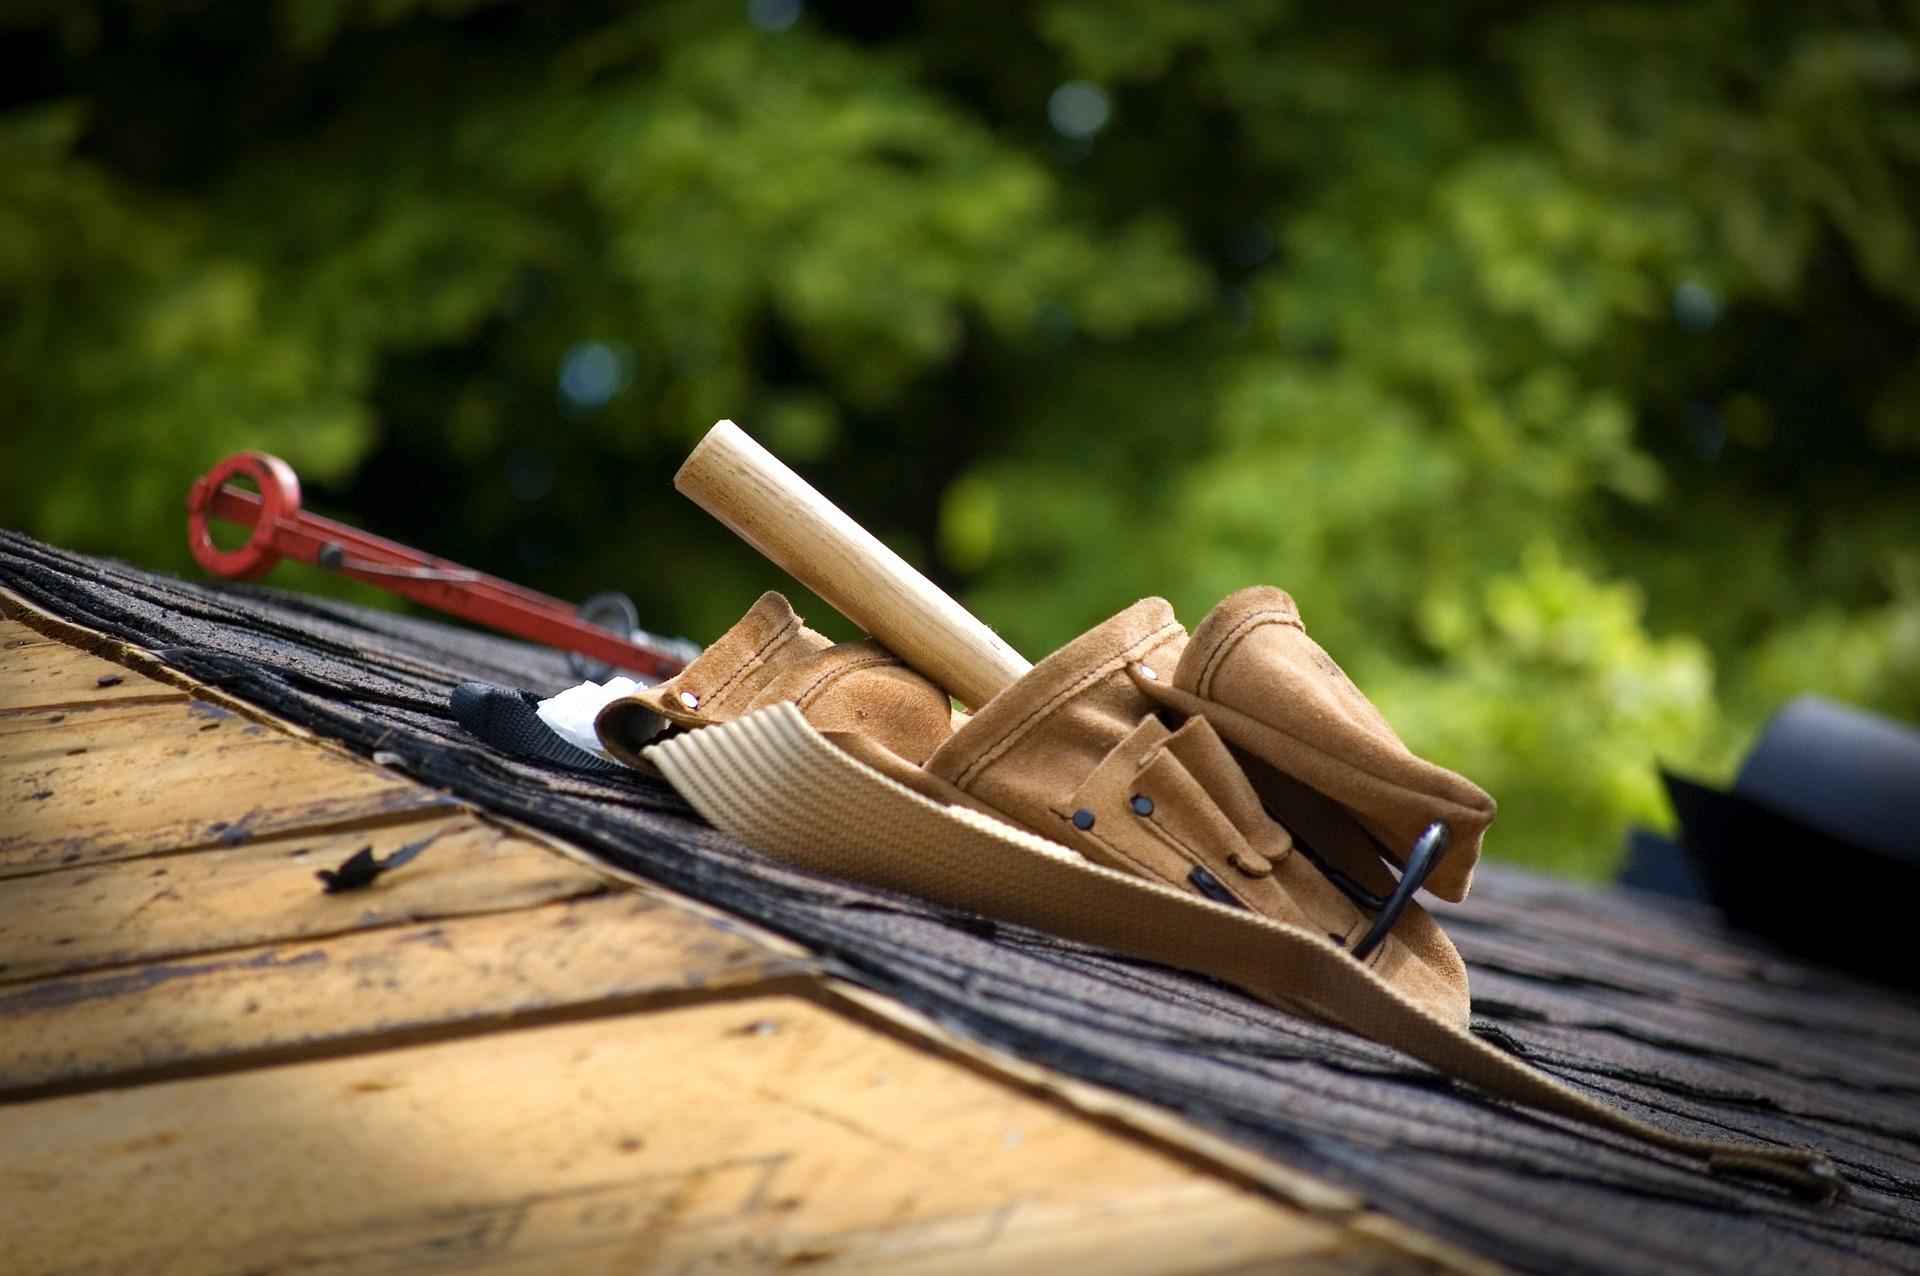 New roof installation preparation